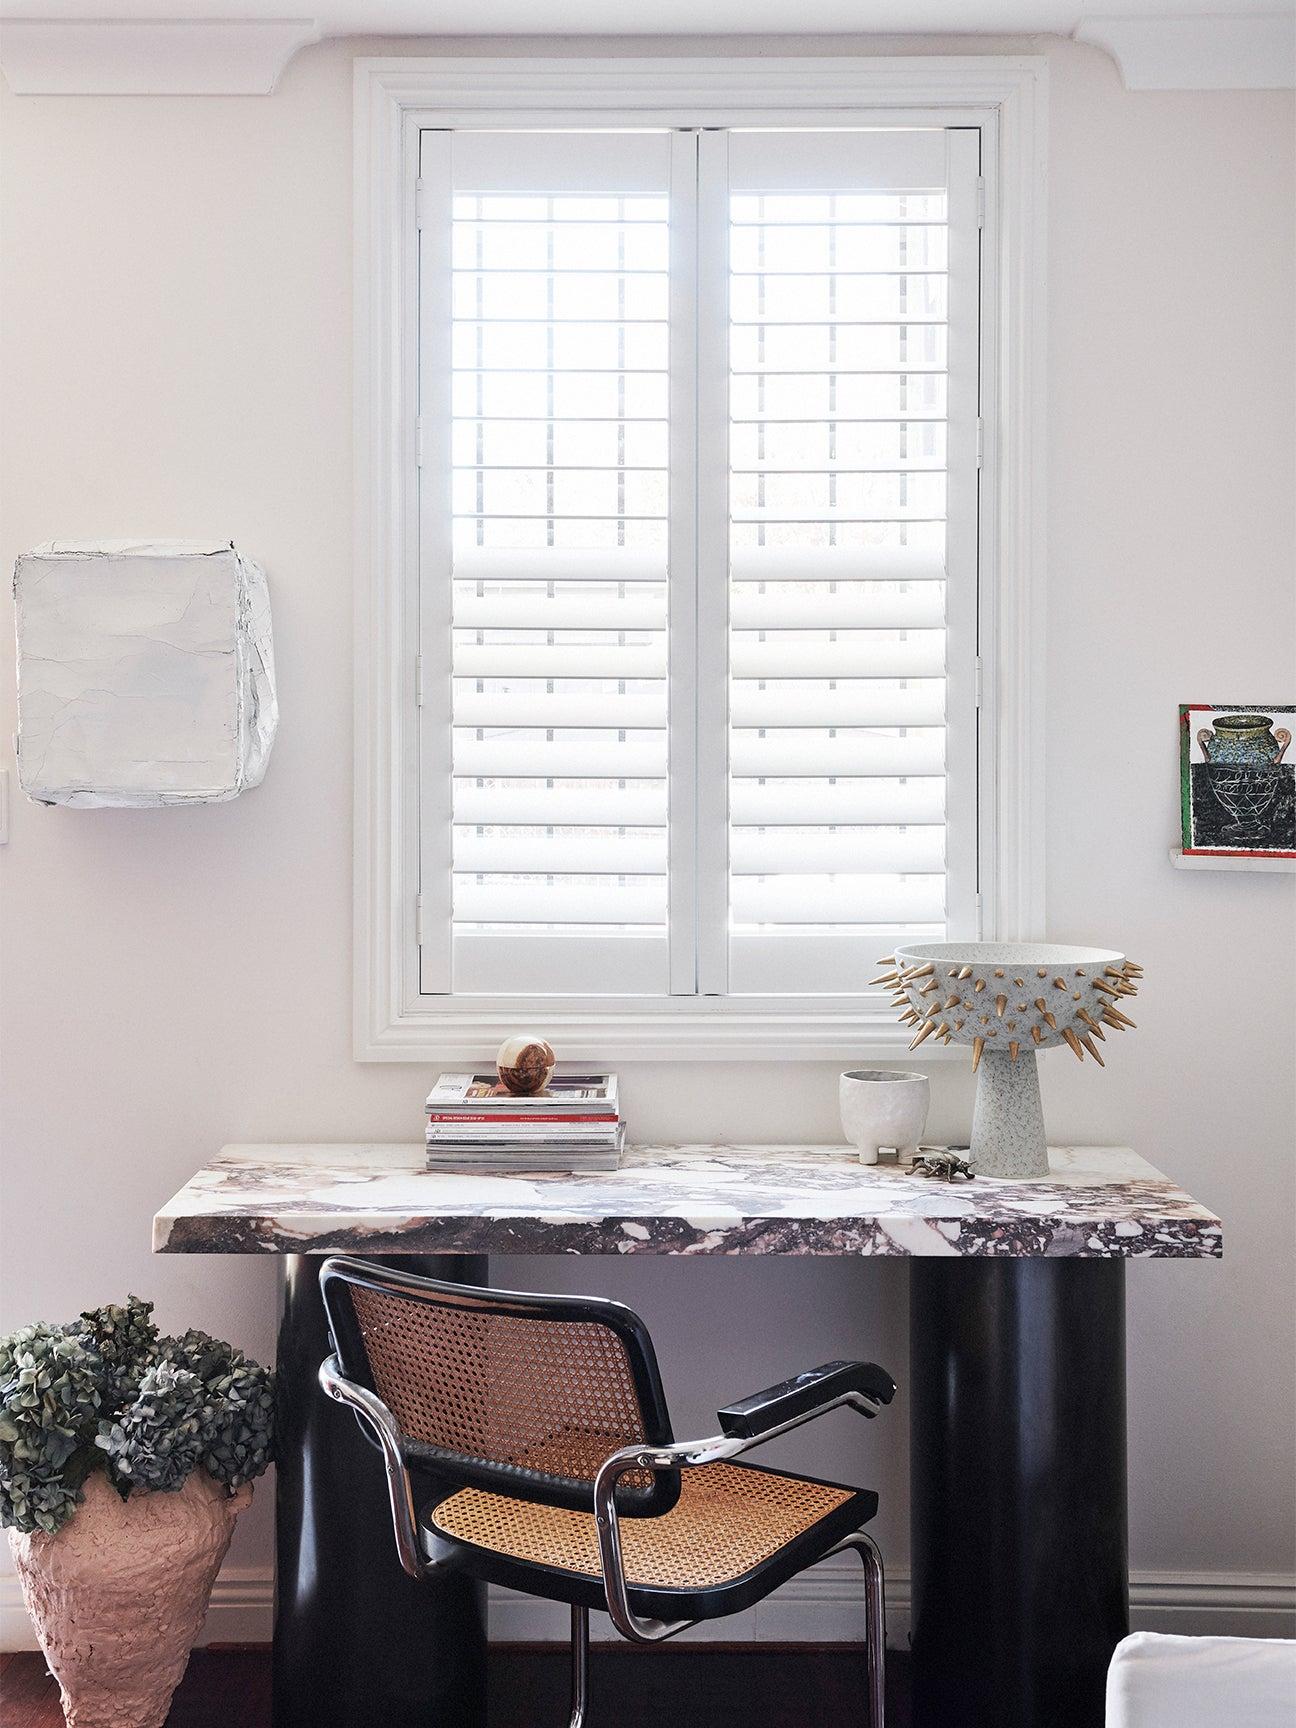 Modern desk overlooking a window.